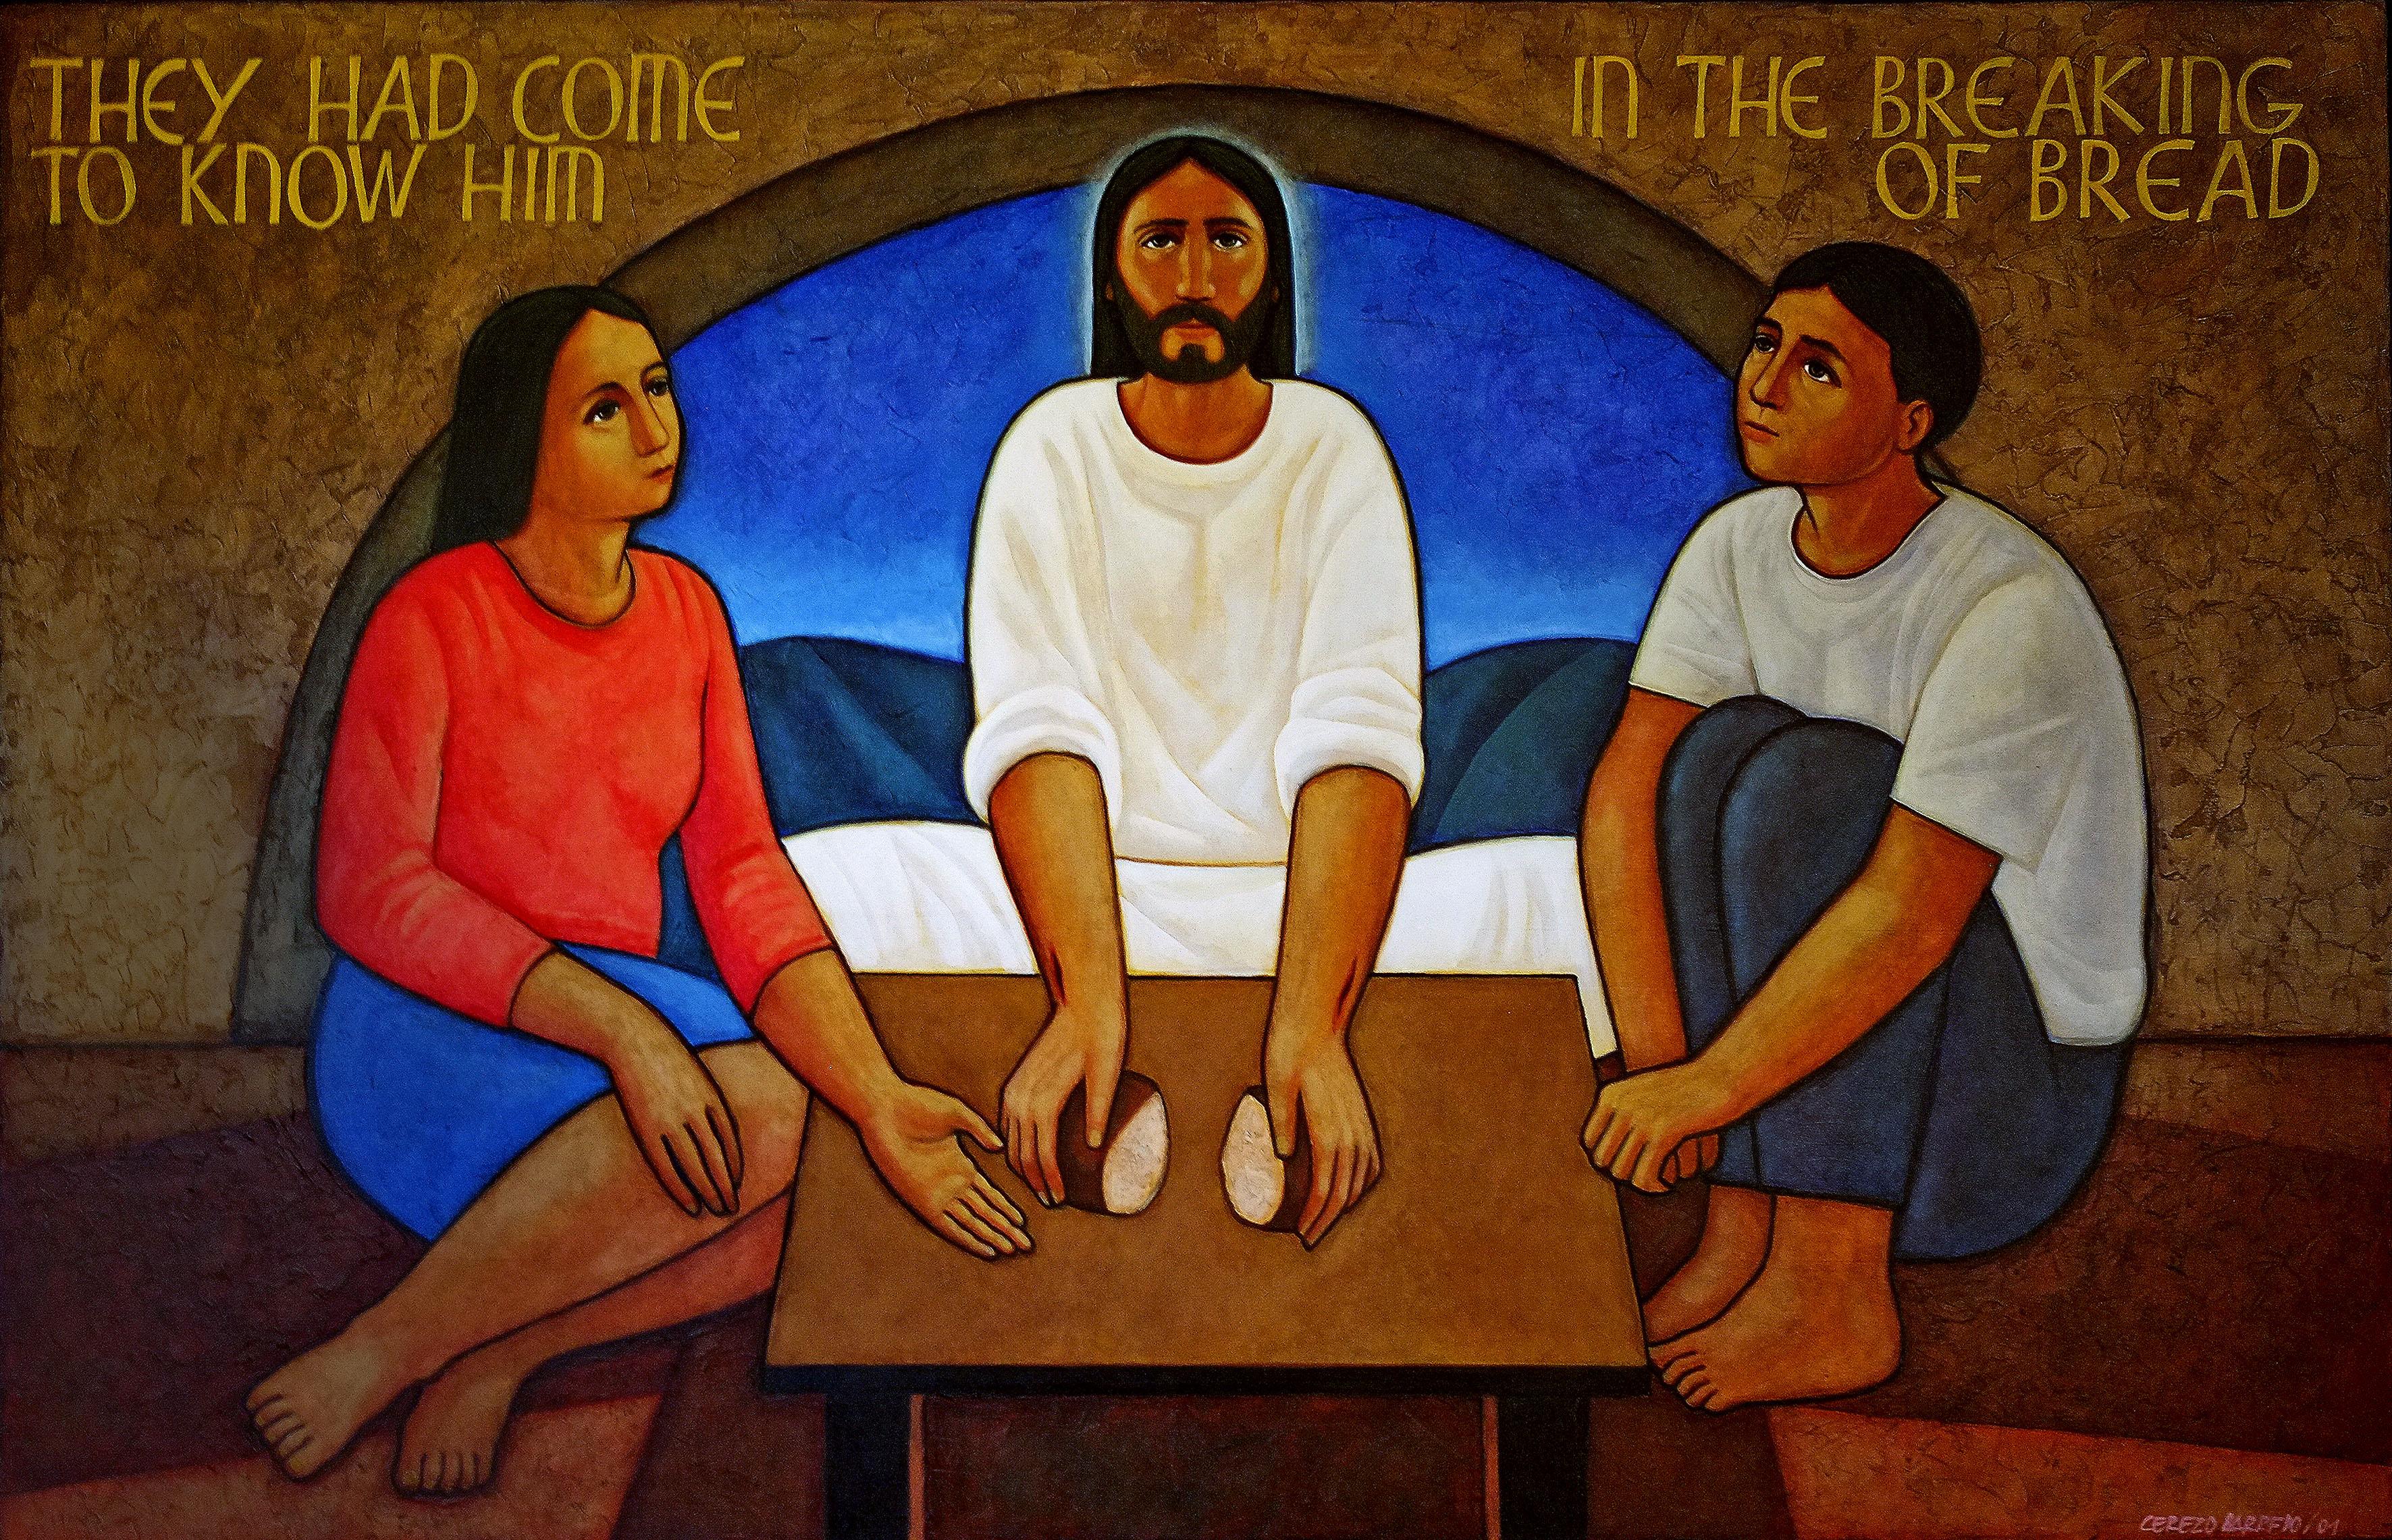 Cerezo Barredo, Maximino_In the Breaking of Bread